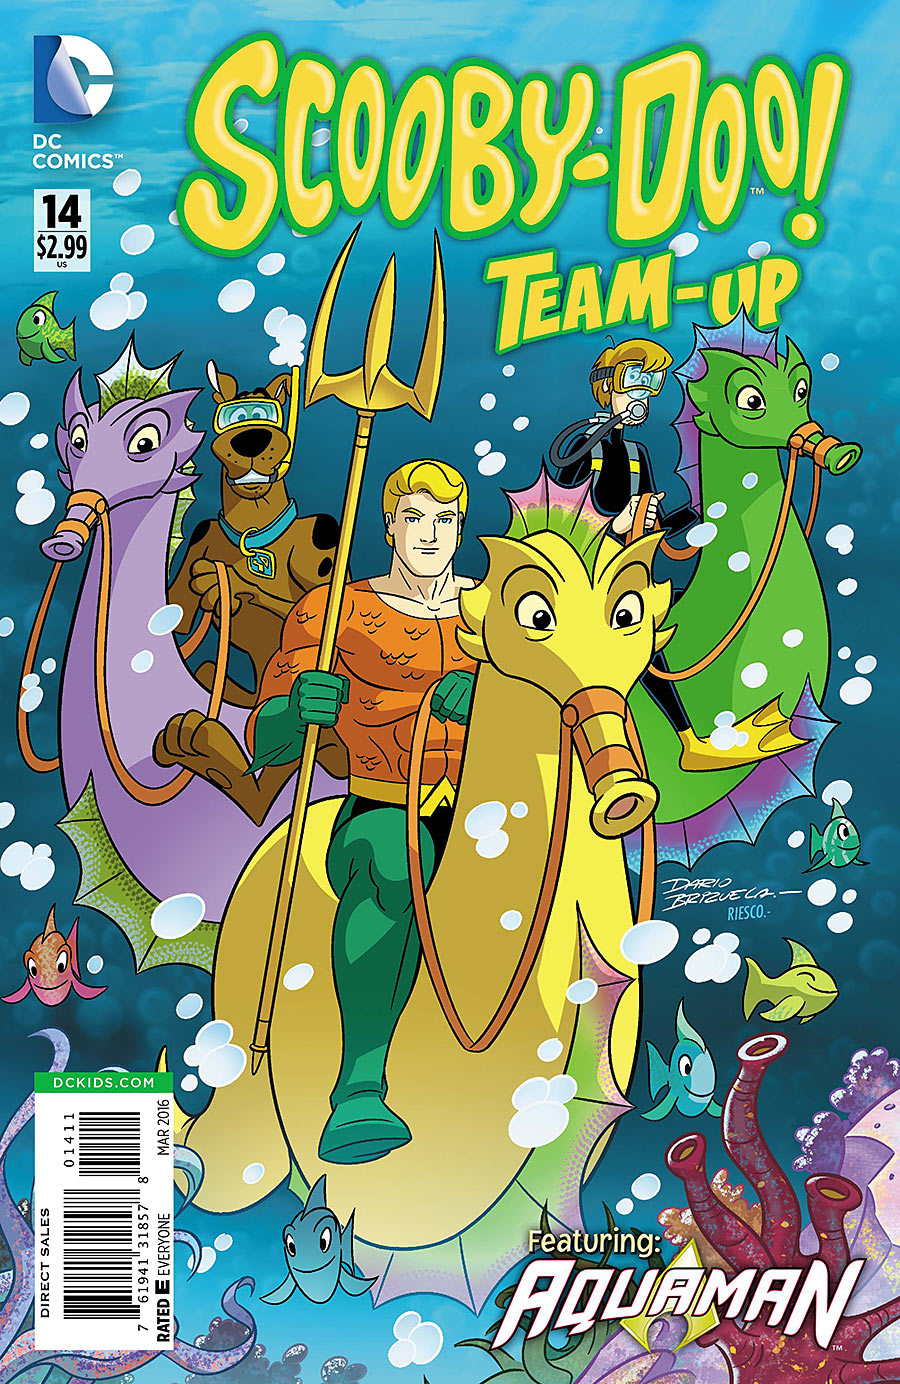 Scooby-Doo! Team-Up issue 14   Scoobypedia   Fandom ...